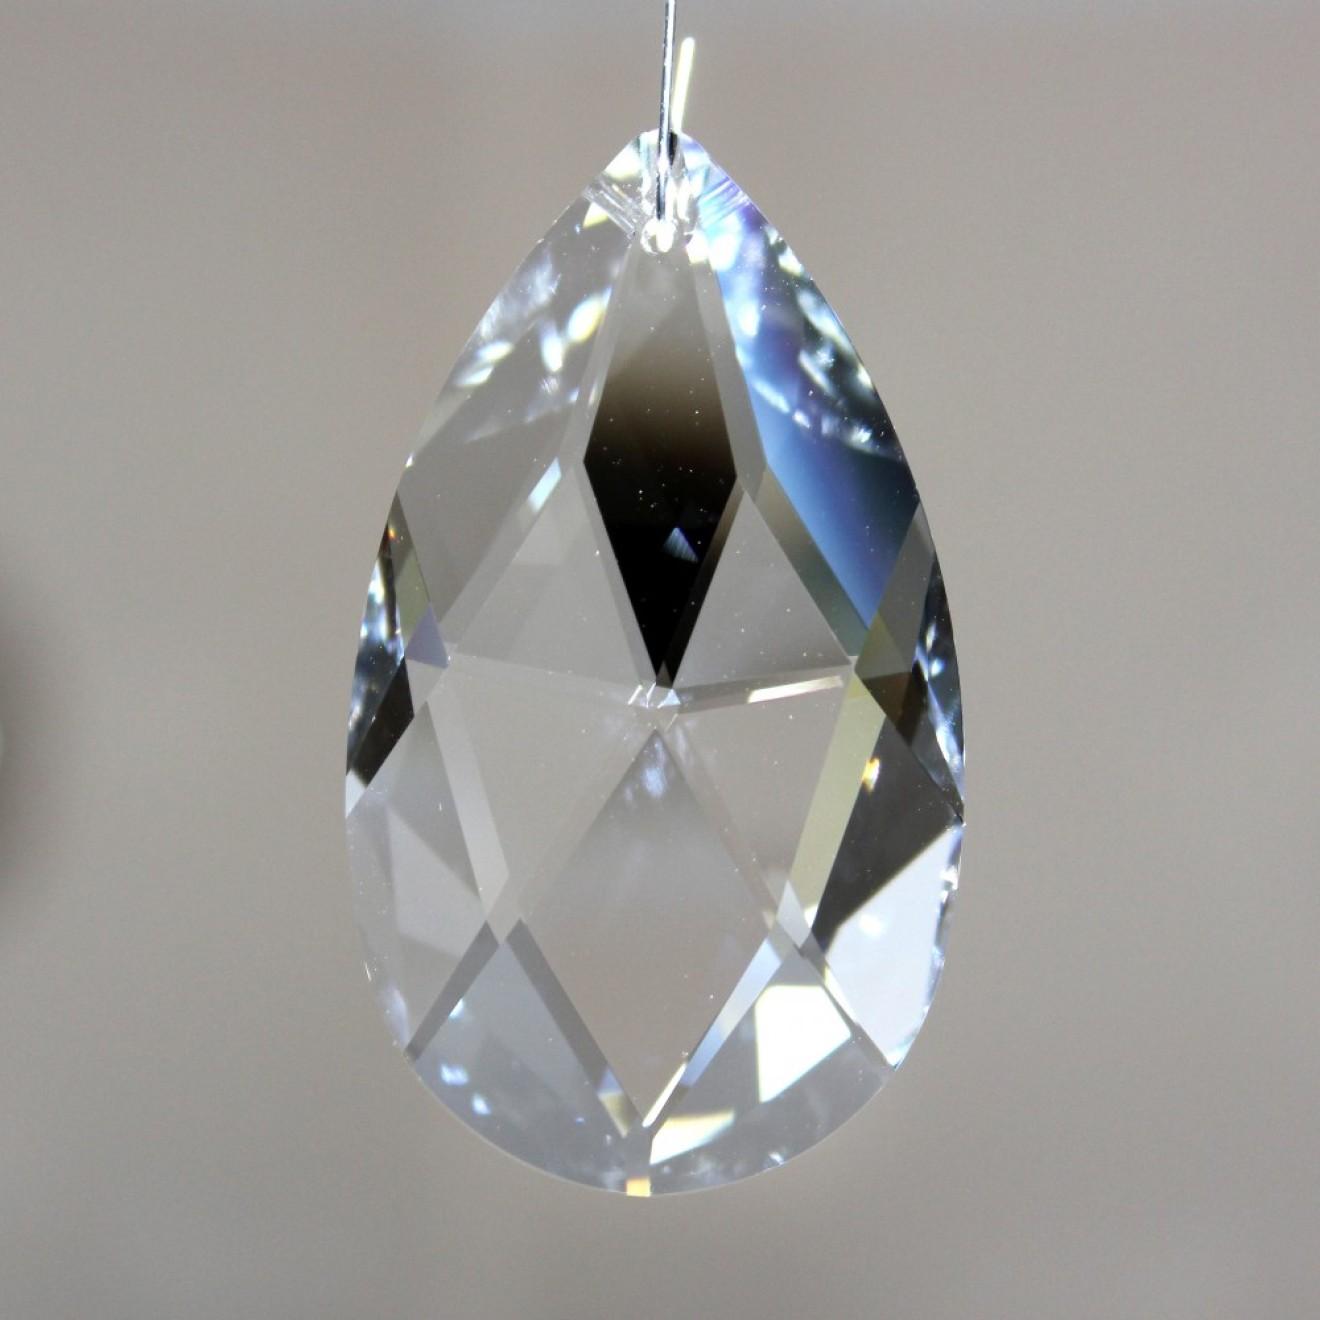 feng shui kristallglas tropfen 63 x 73 mm bleifrei. Black Bedroom Furniture Sets. Home Design Ideas